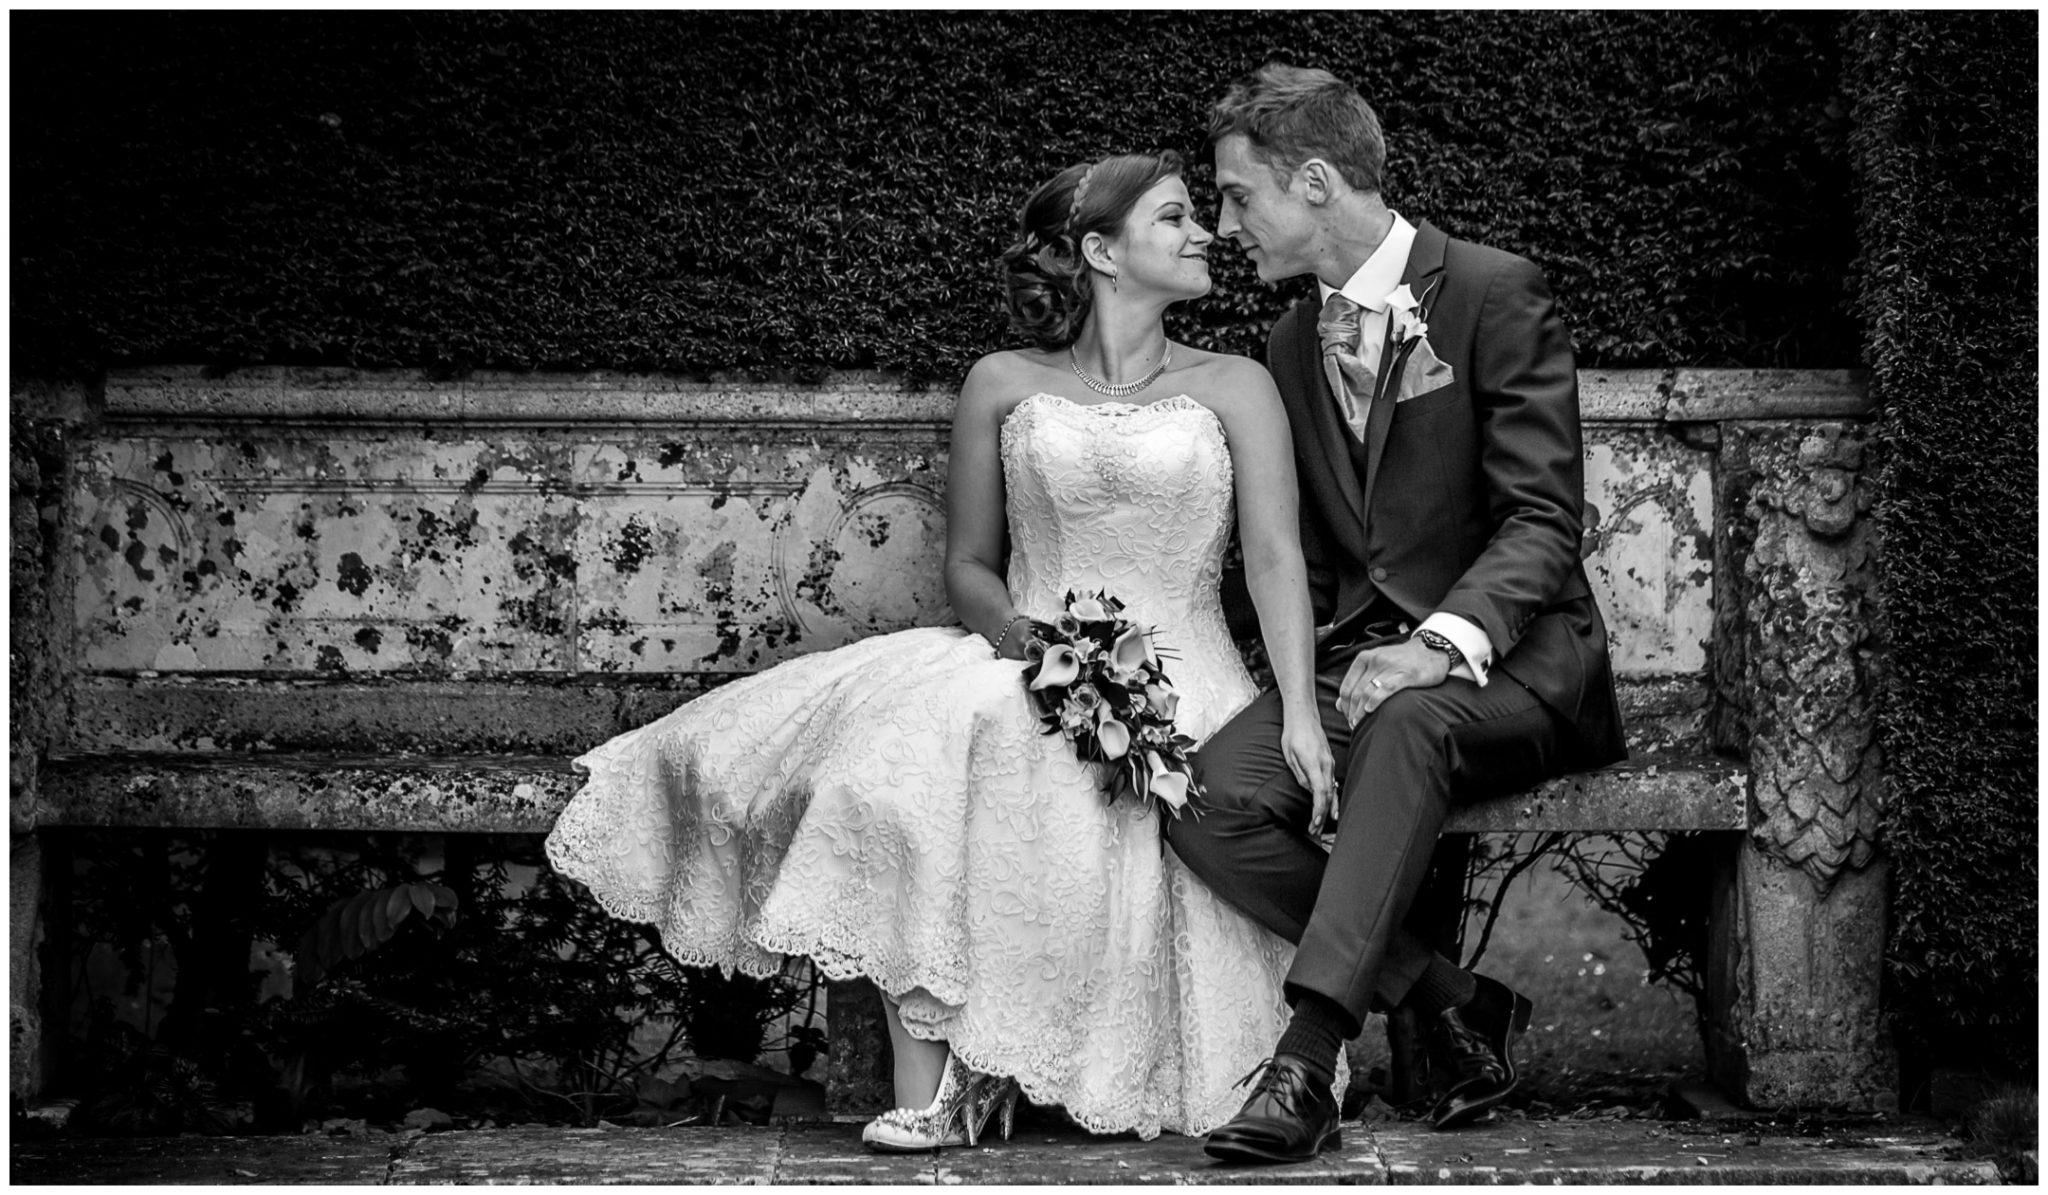 Avington Park wedding photography couple on stone bench